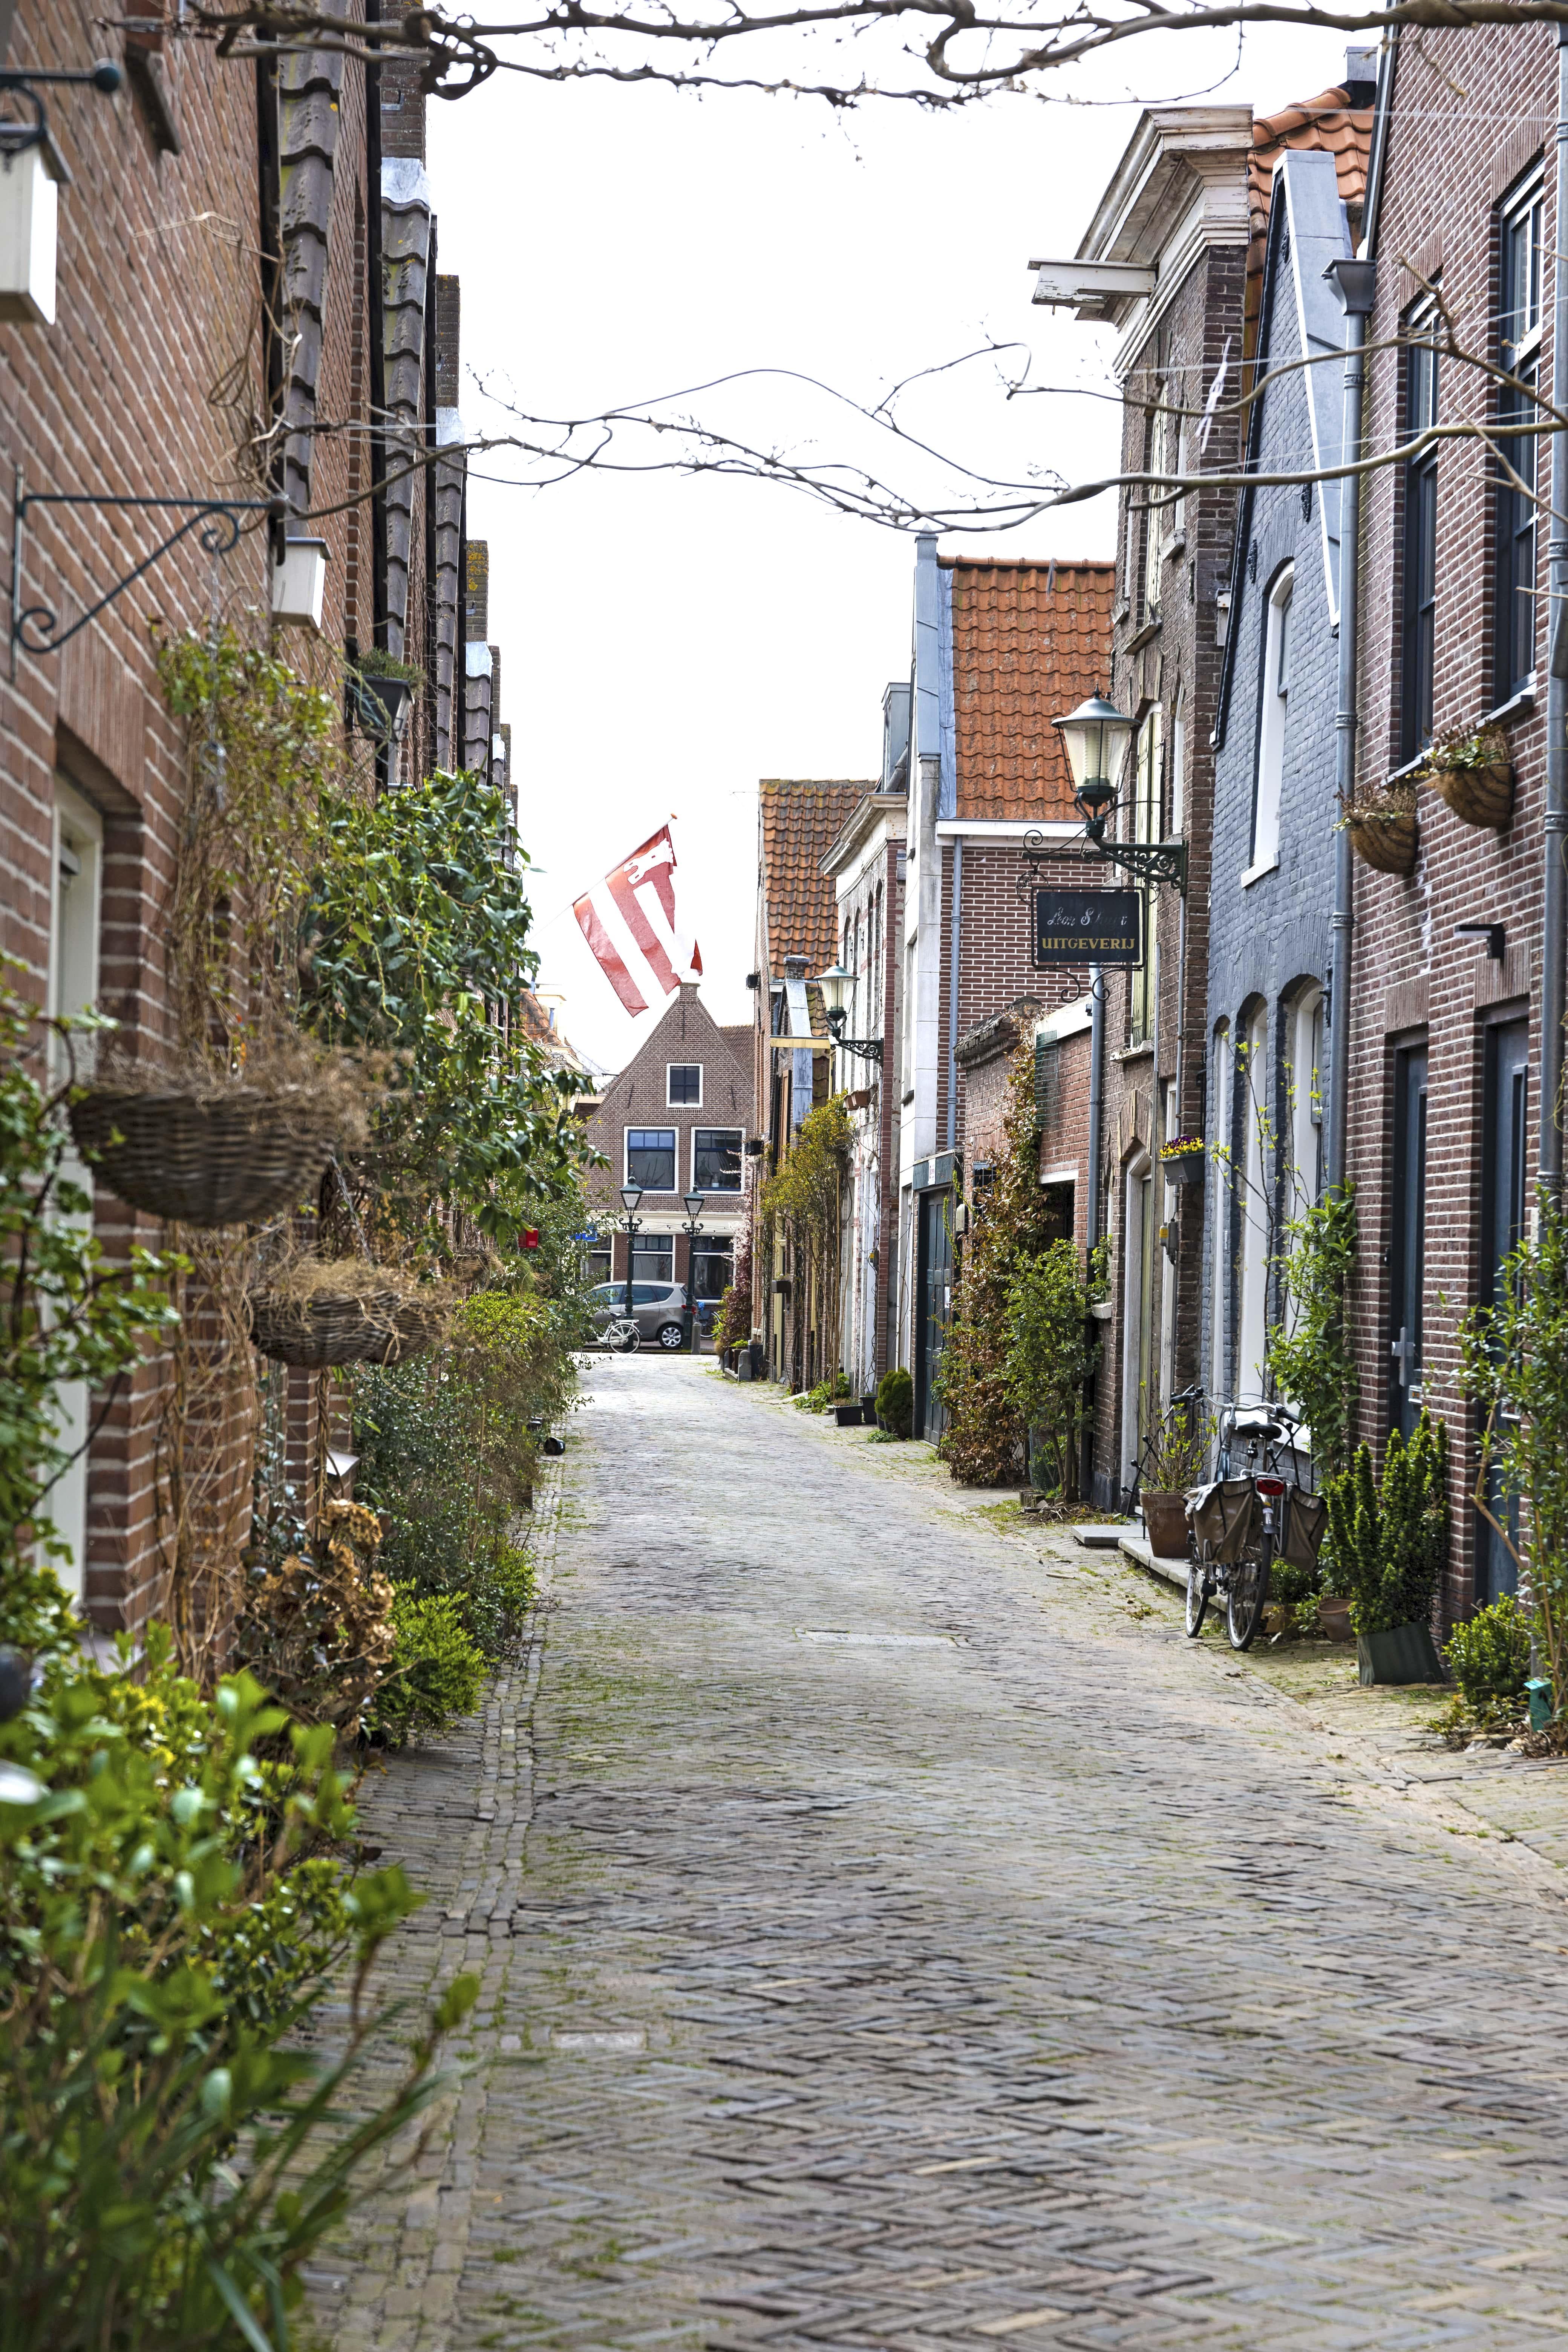 Ga op pad en ontdek deze buitengewone, oer-Hollandse plekjes